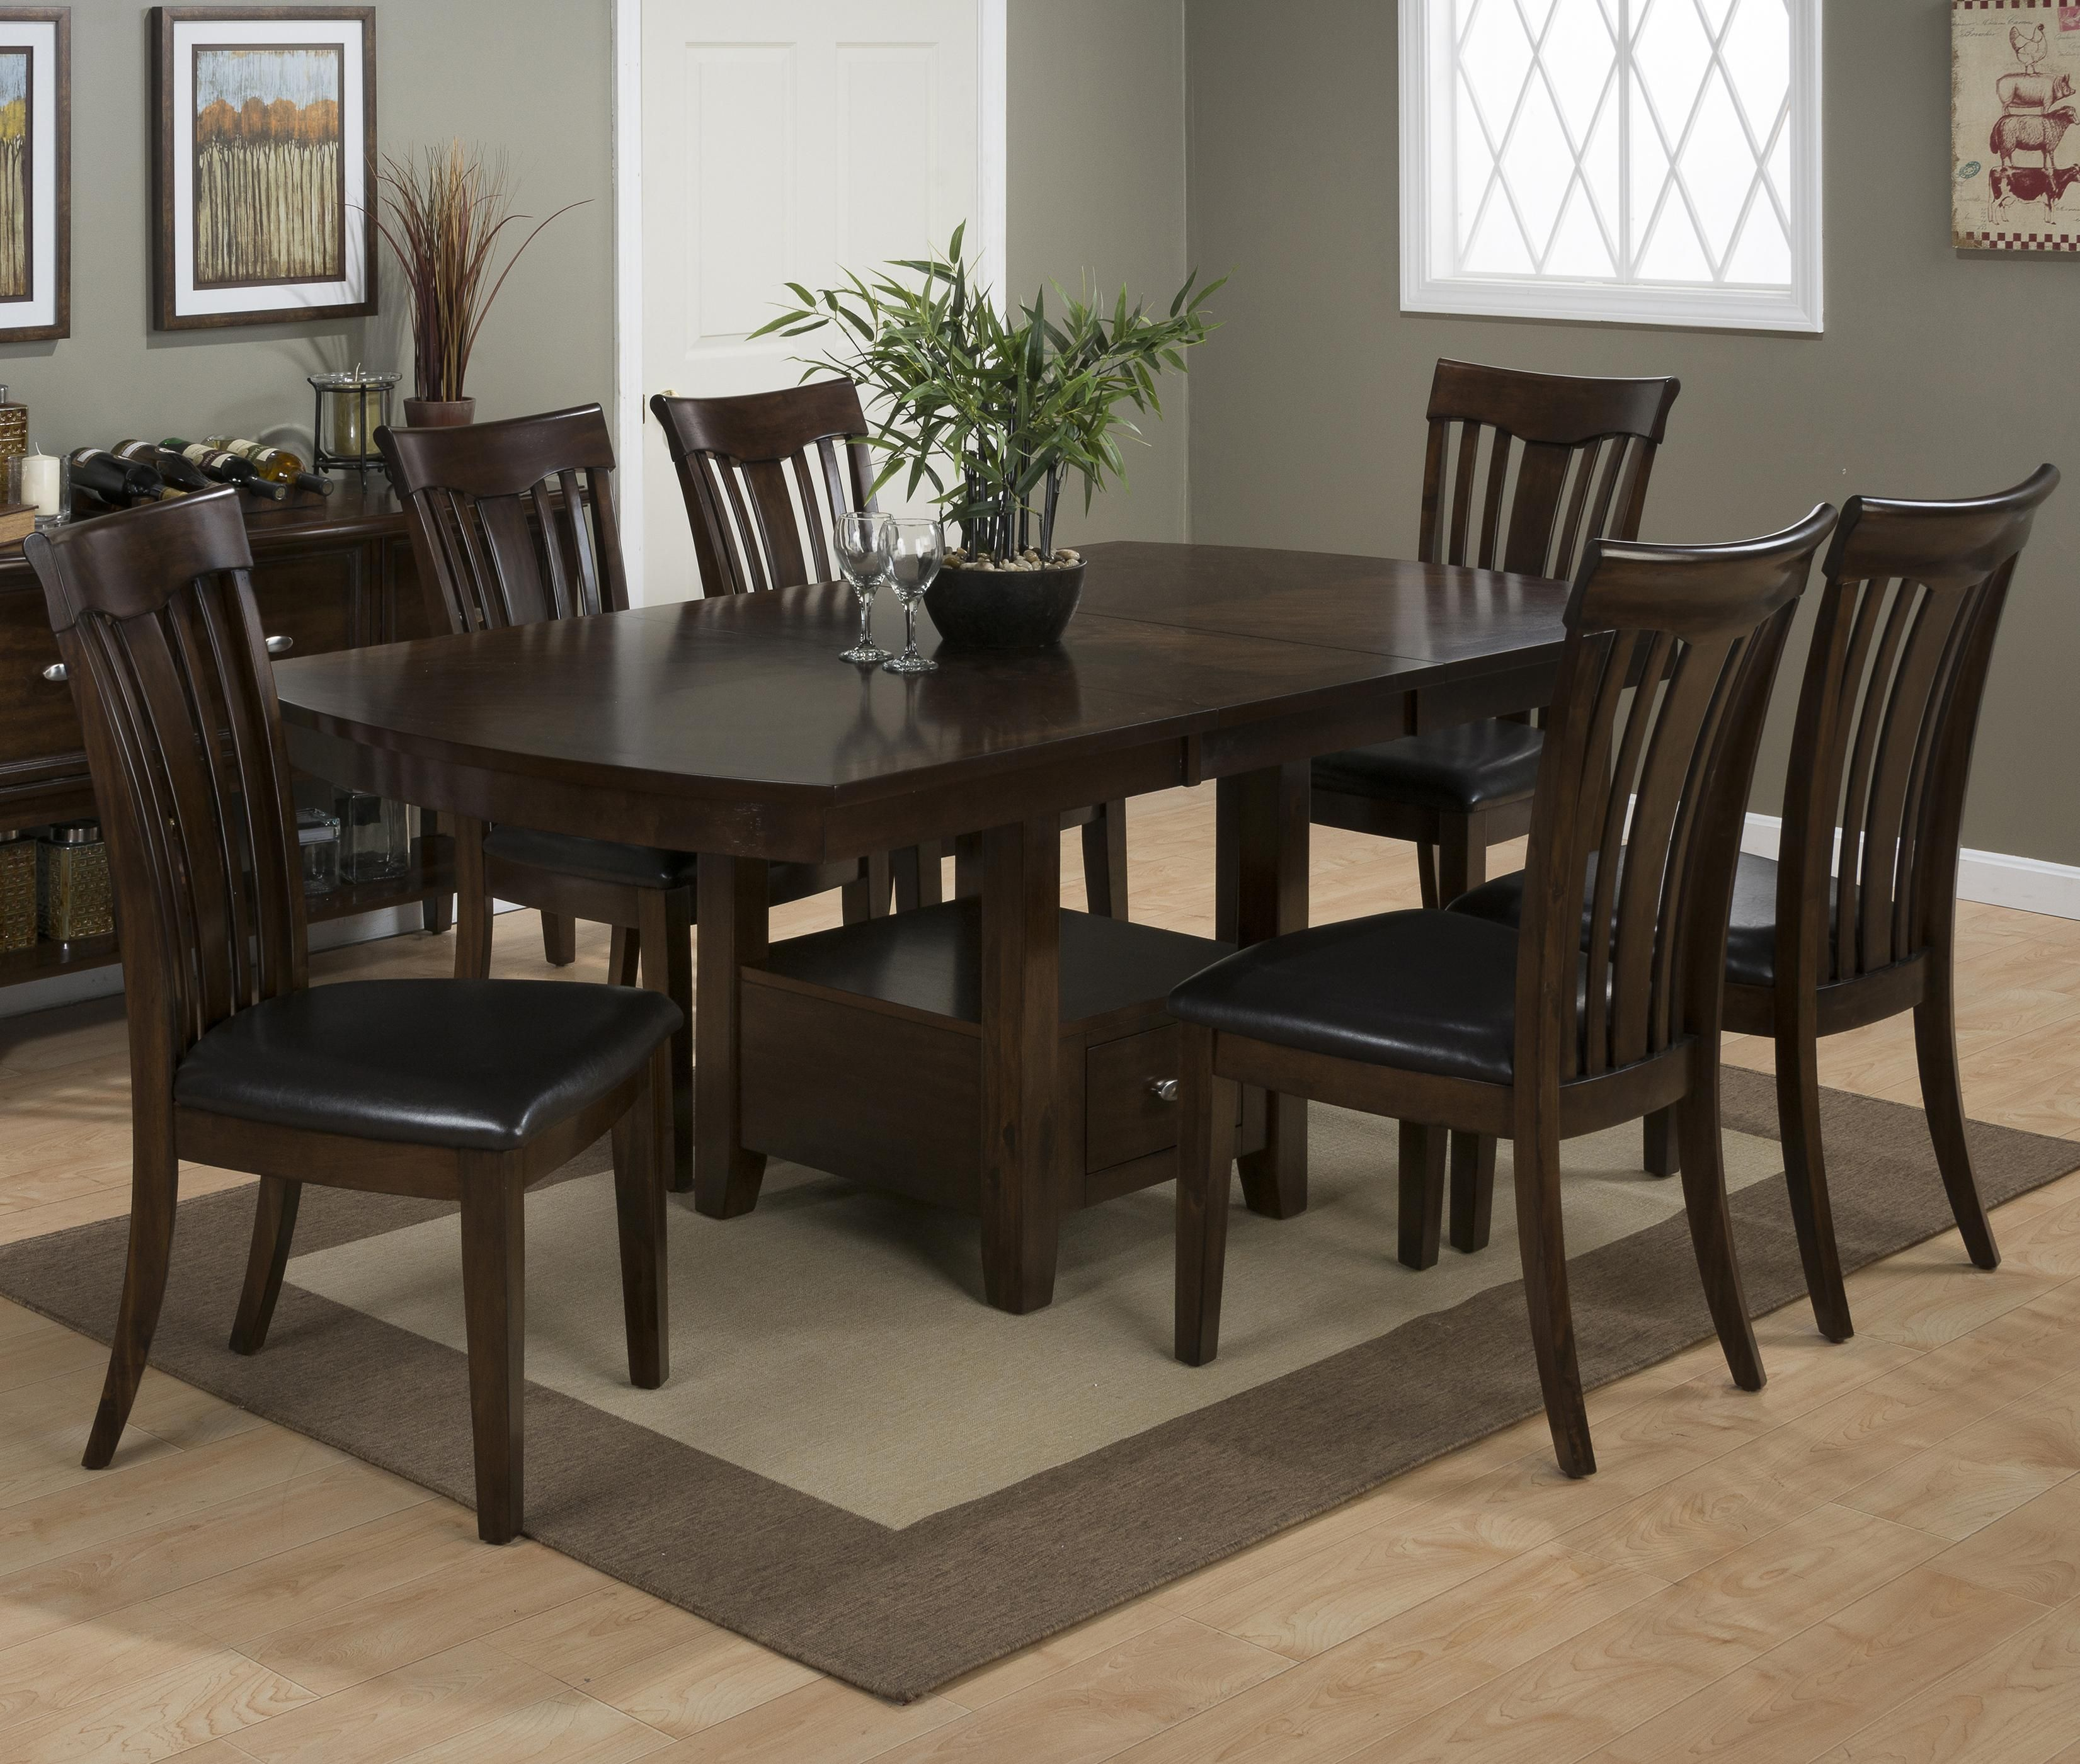 Dining Room Chairs Kansas City mirabella - classic height dining set - 836setclassic dining sets